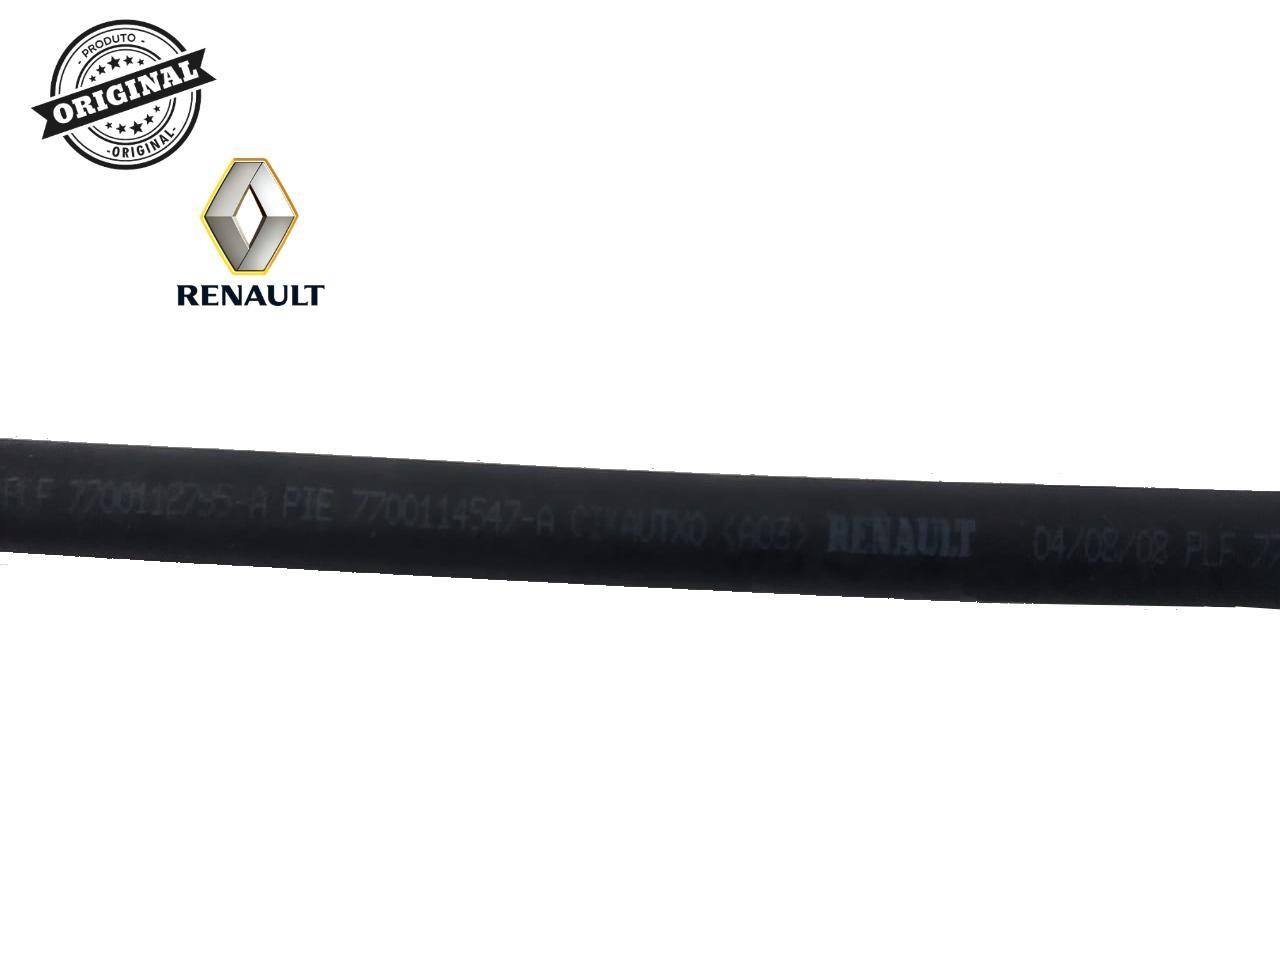 MANGUEIRA DO RESPIRO OLEO RENAULT CLIO II / KANGOO MOTOR 1.0 8V D7D (FINA)